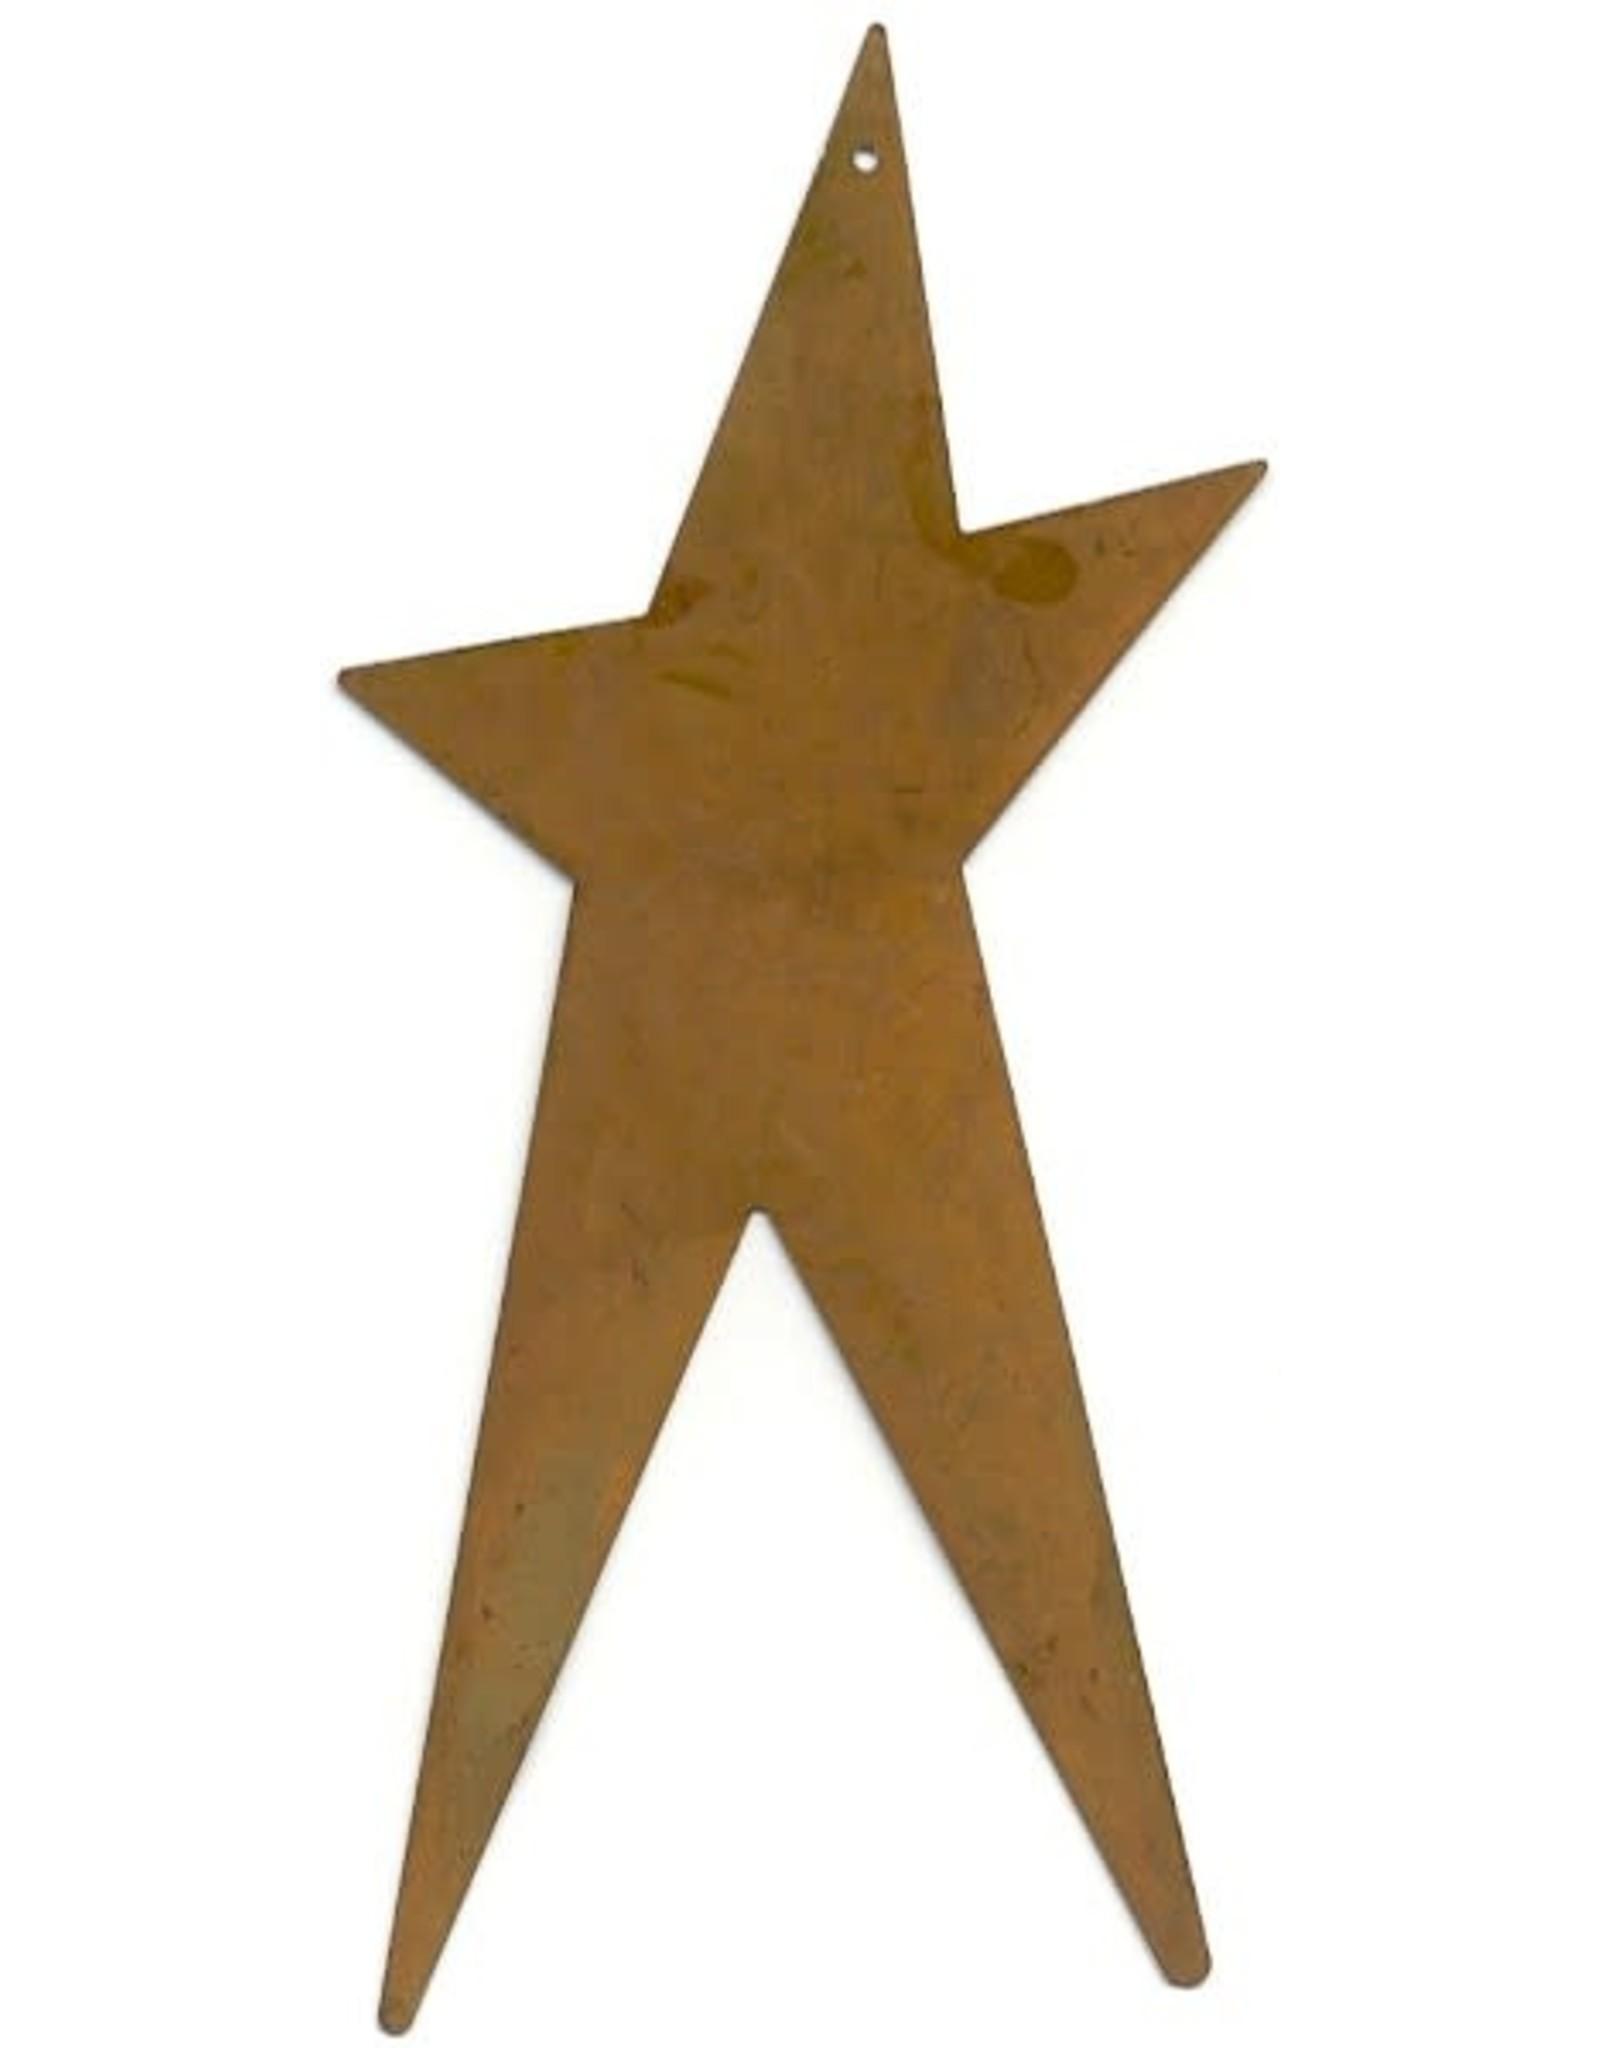 "RUSTY TIN FOLK STAR 6"" (WITH HOLE) PACKAGED 12"